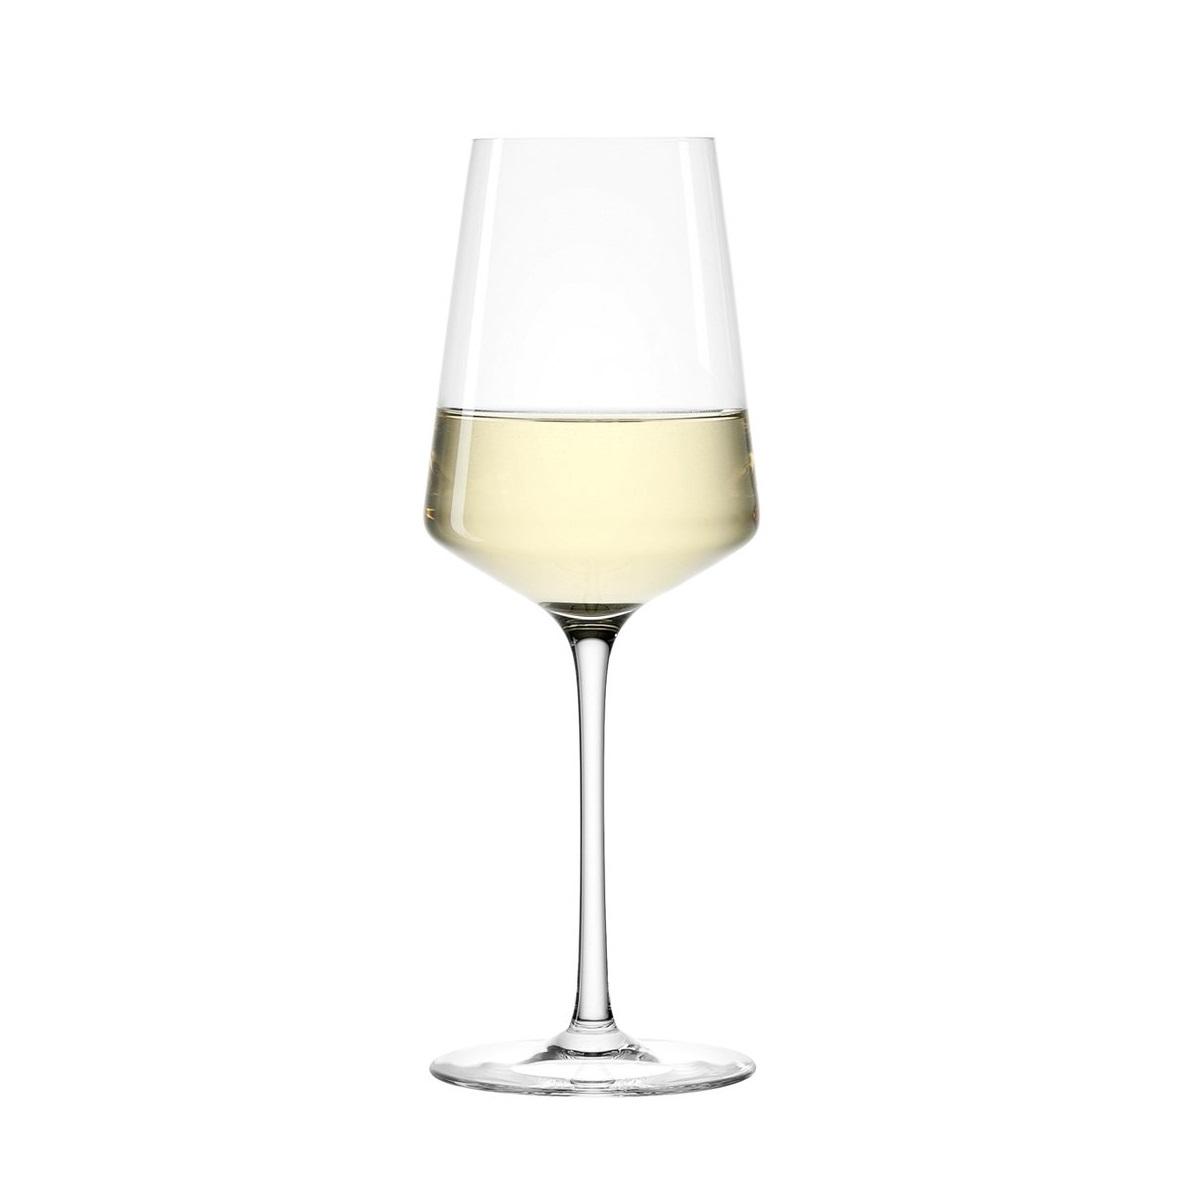 513OF9yO2tL. SL1200  - Pahar pentru vin alb Puccini 400 ml (L069540)